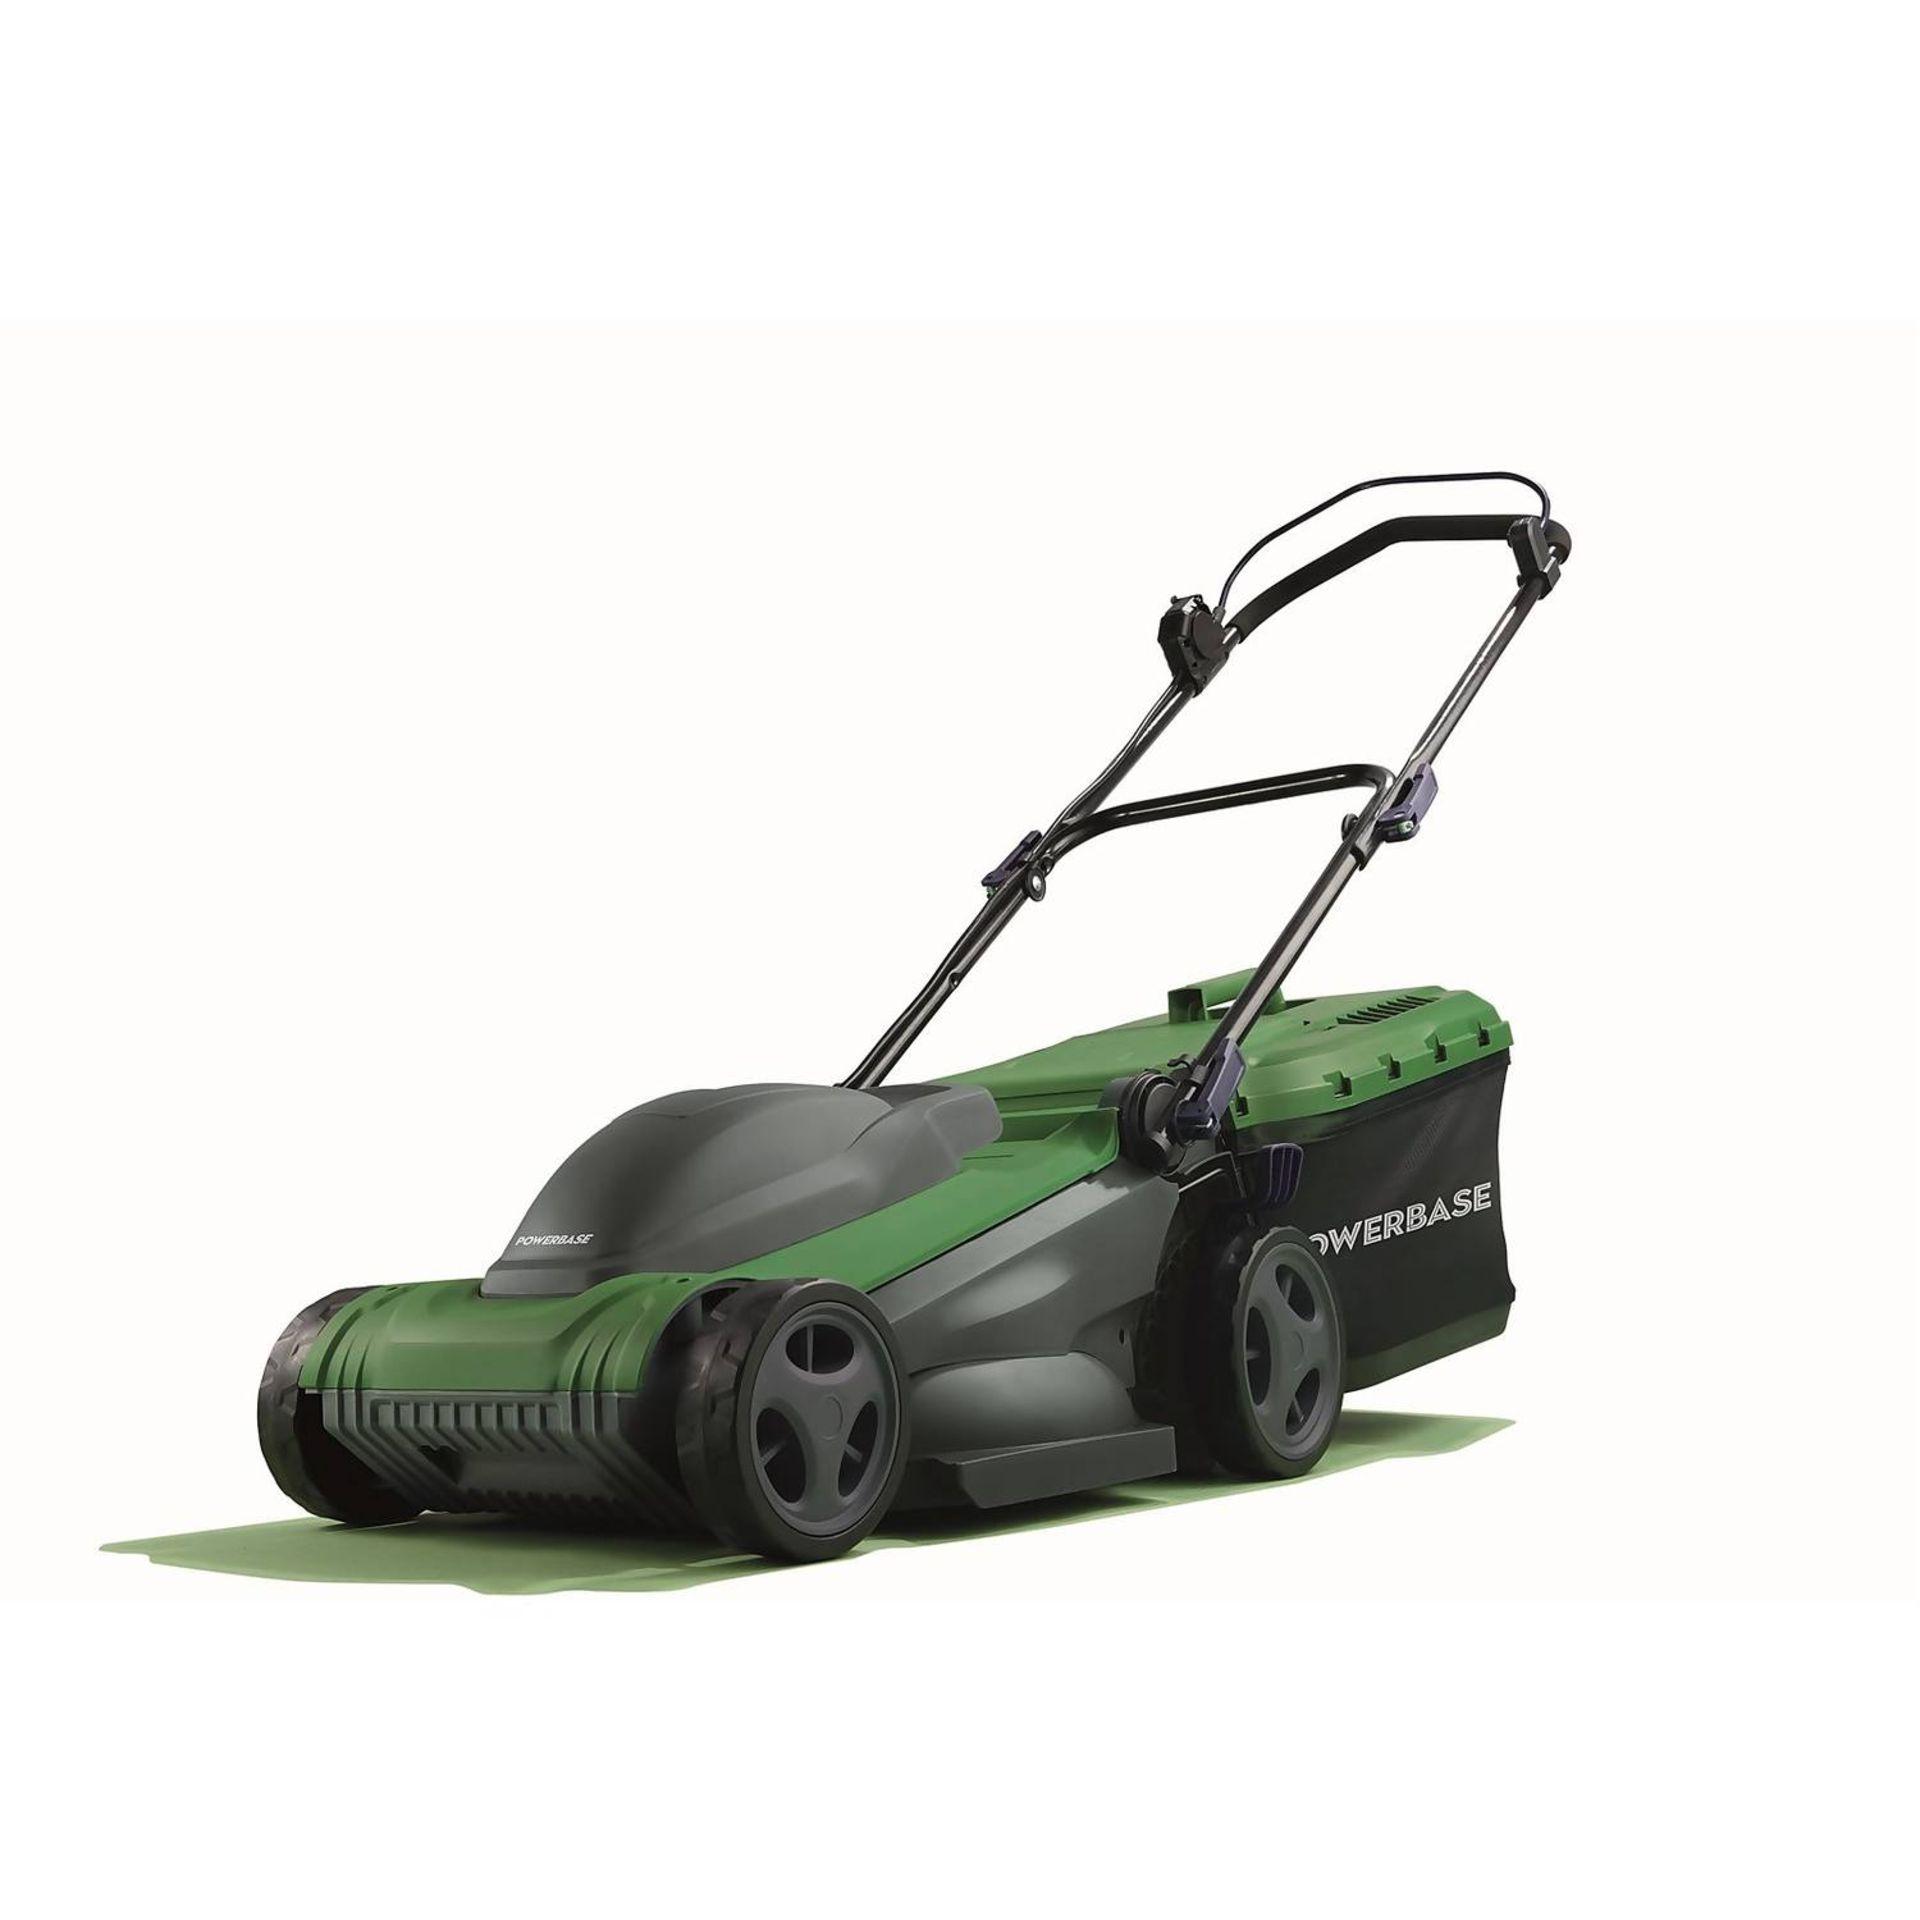 (P7) 2x Powerbase 37cm 1600W Electric Rotary Lawn Mower RRP £99 Each.